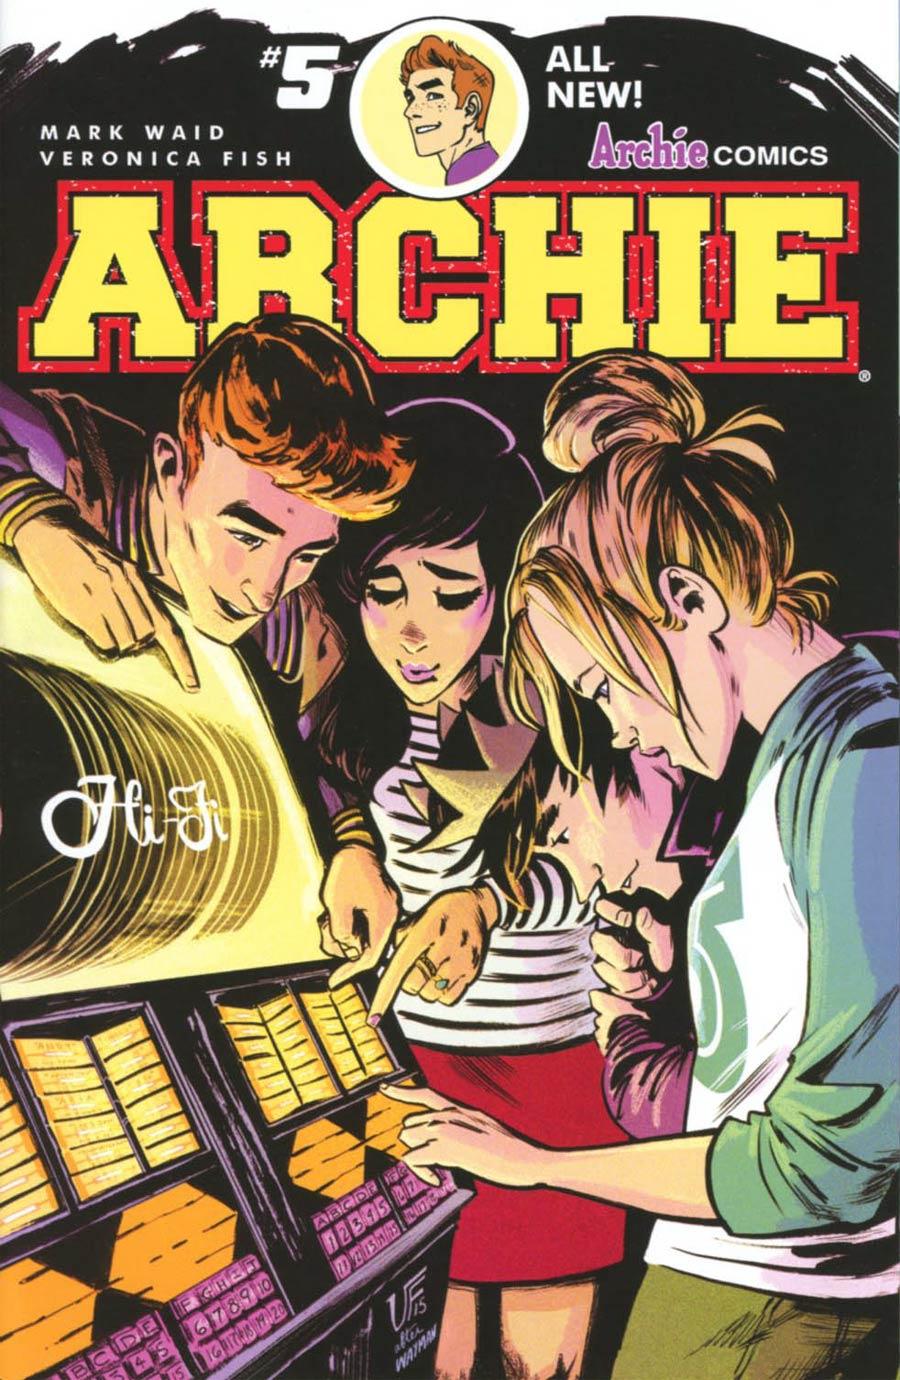 Archie Vol 2 #5 Cover A Regular Veronica Fish Cover